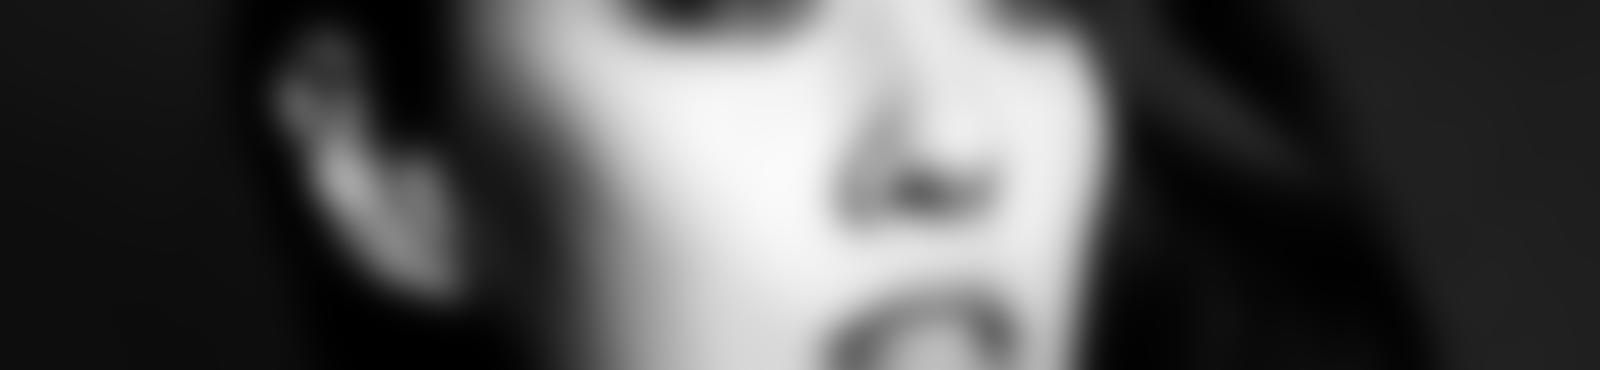 Blurred 197c870e 37c2 4734 ab45 914e9930927f